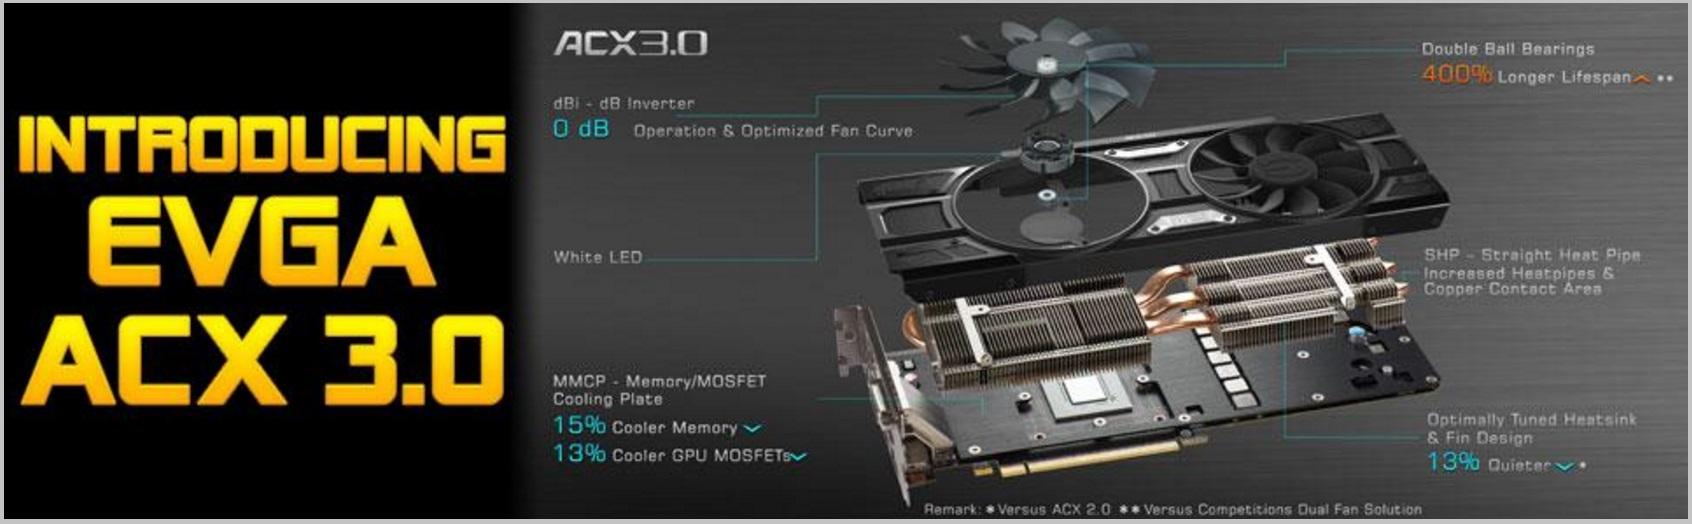 PC Components - Part 3: EVGA GeForce GTX 1060   Hardware-Pro Com